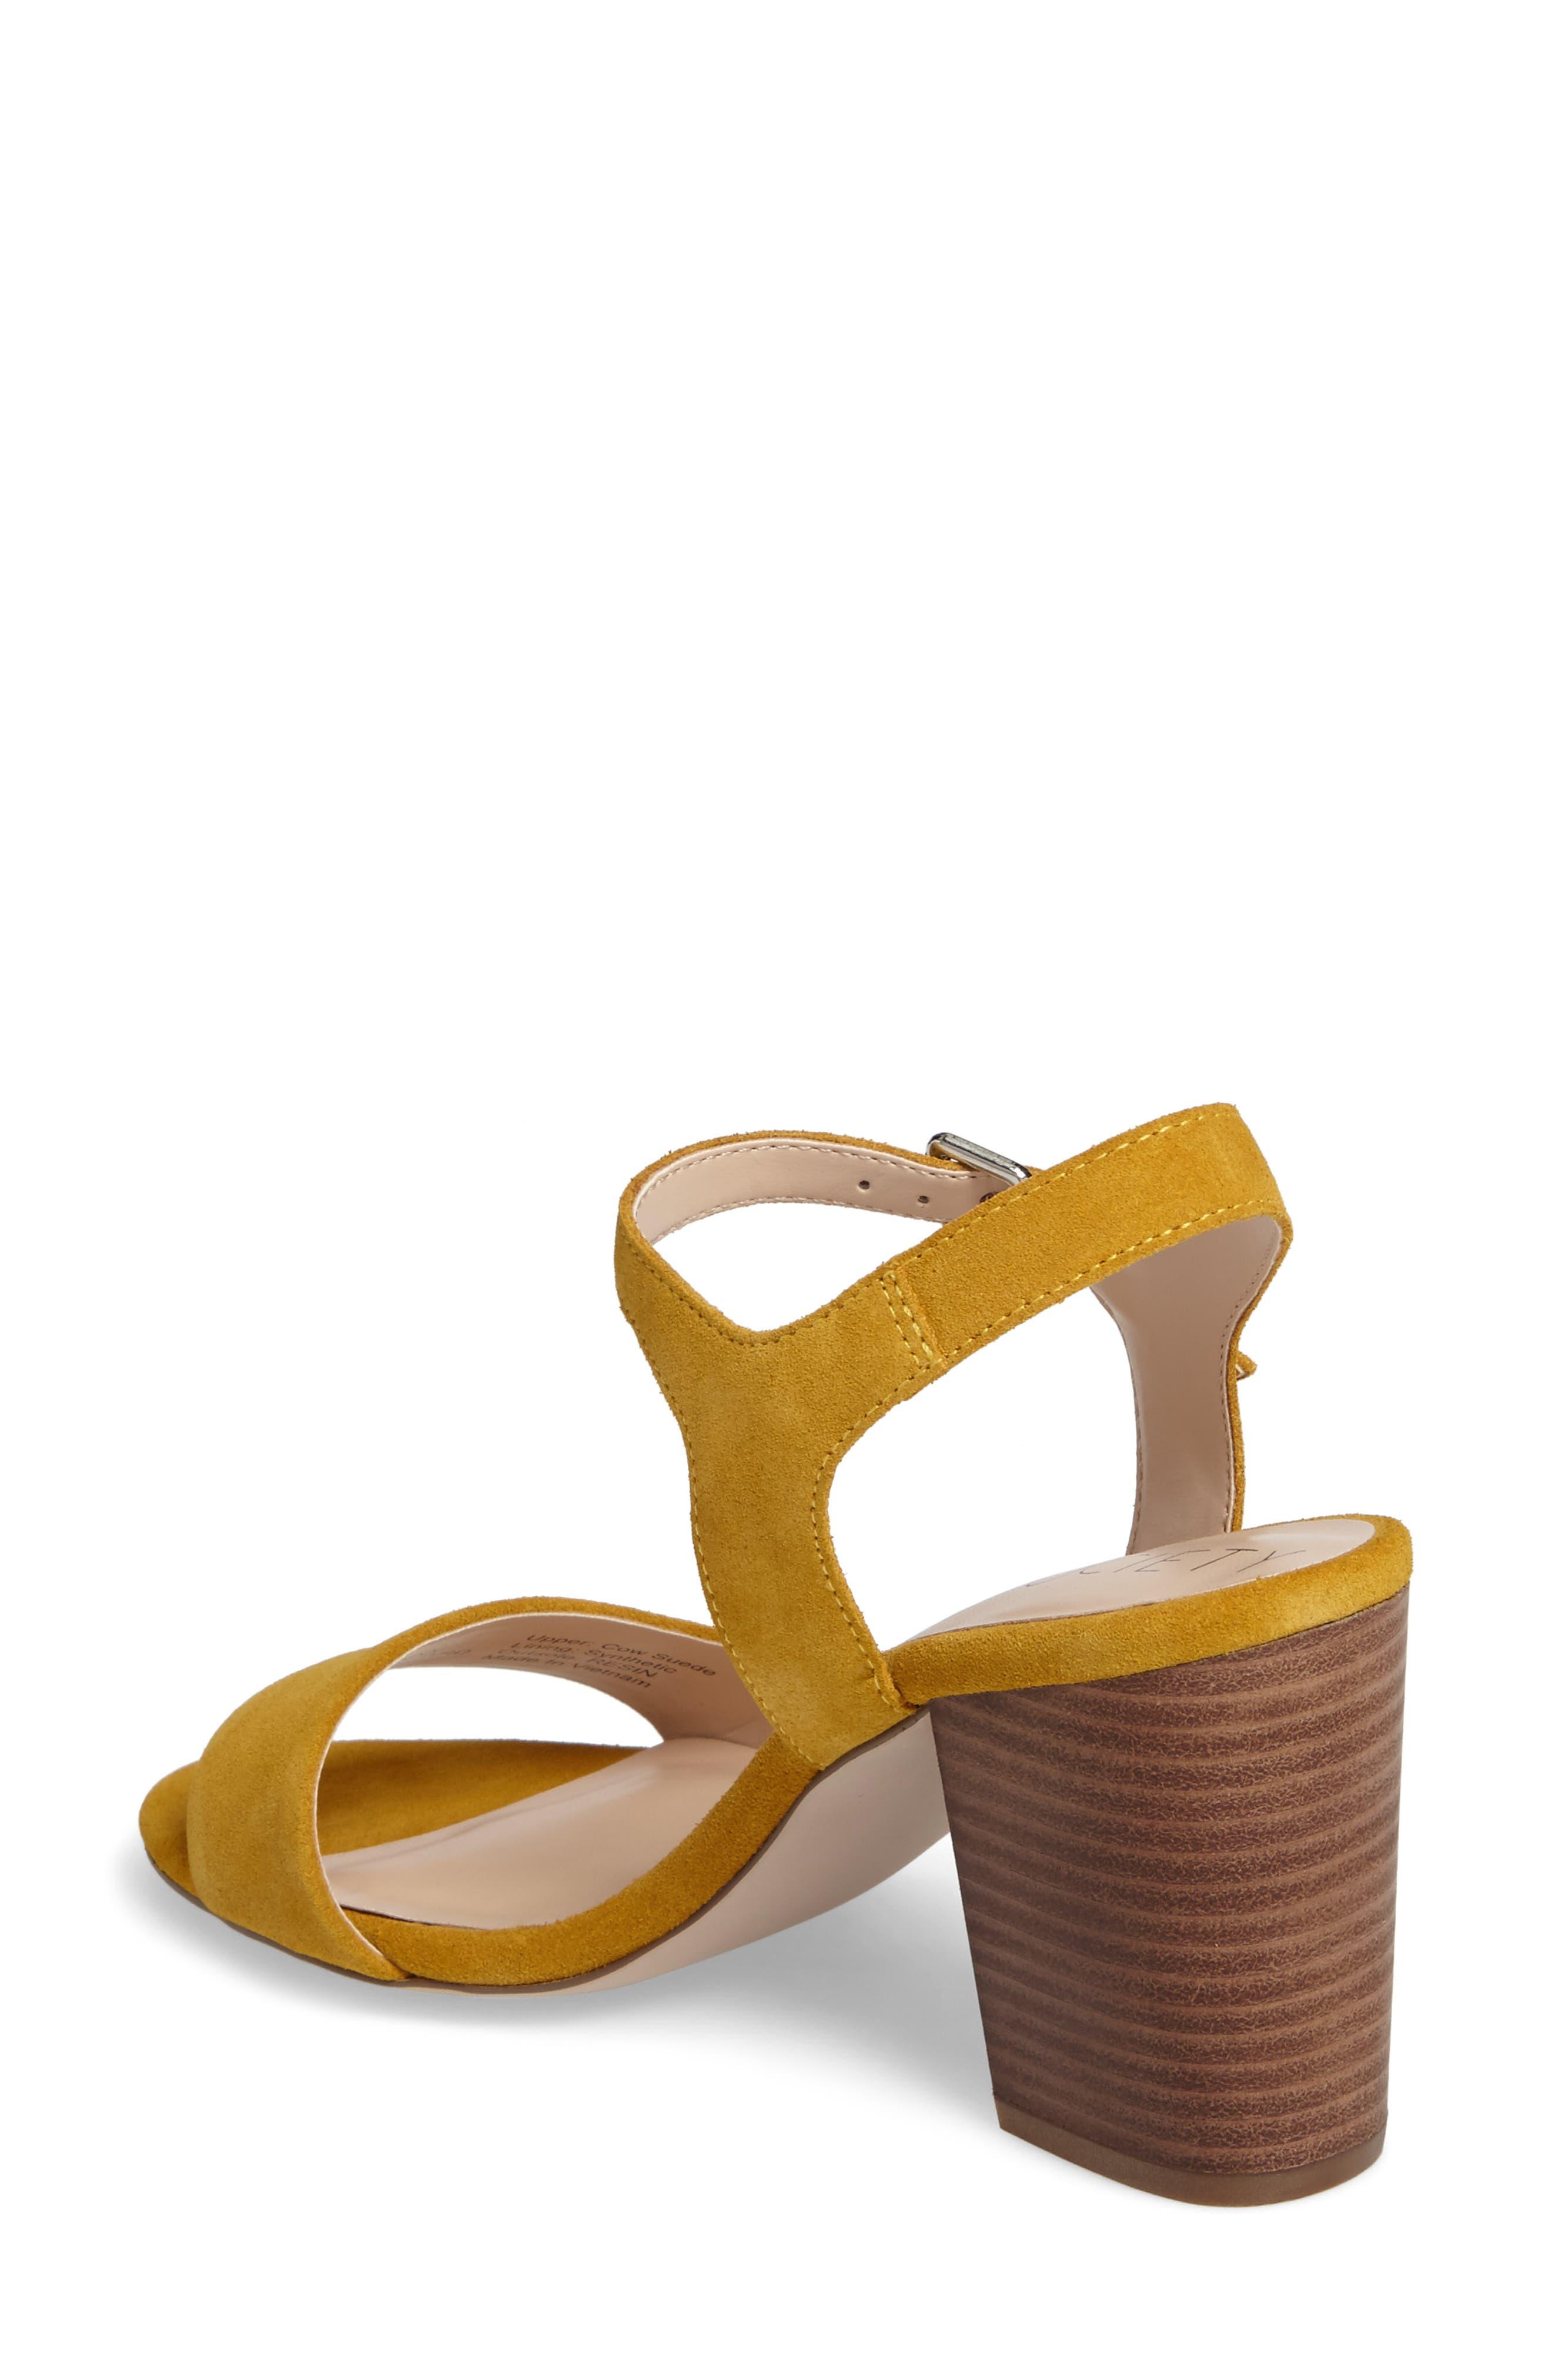 'Linny' Ankle Strap Sandal,                             Alternate thumbnail 10, color,